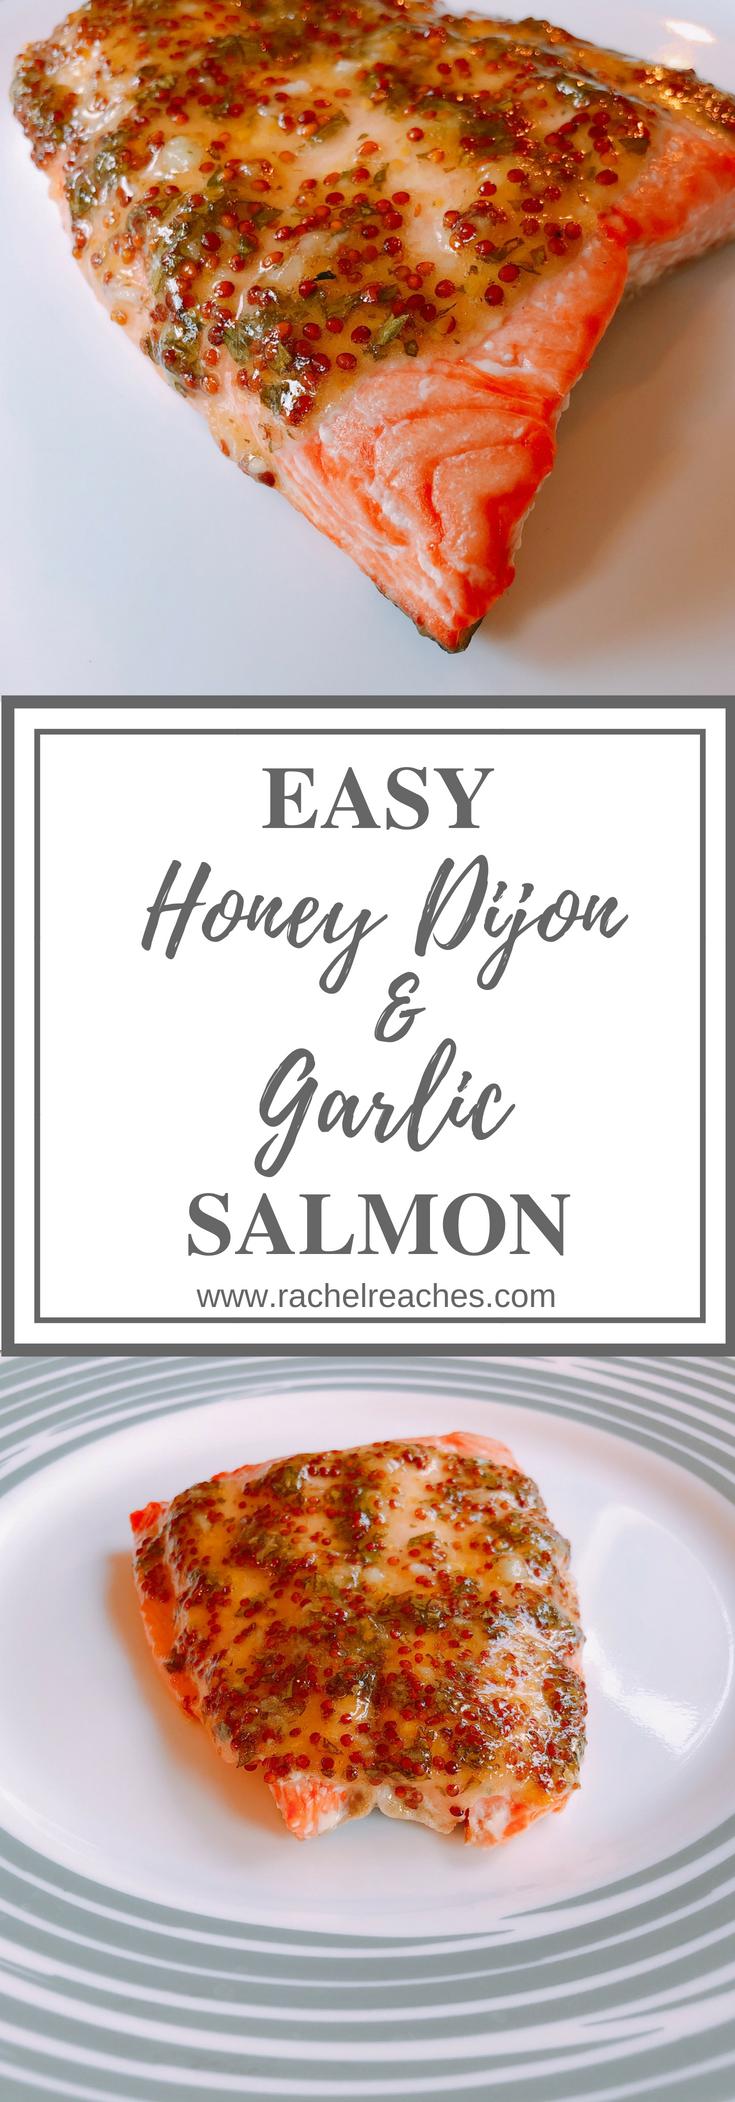 Honey Dijon & Garlic Salmon Pin - Healthy Eating.png